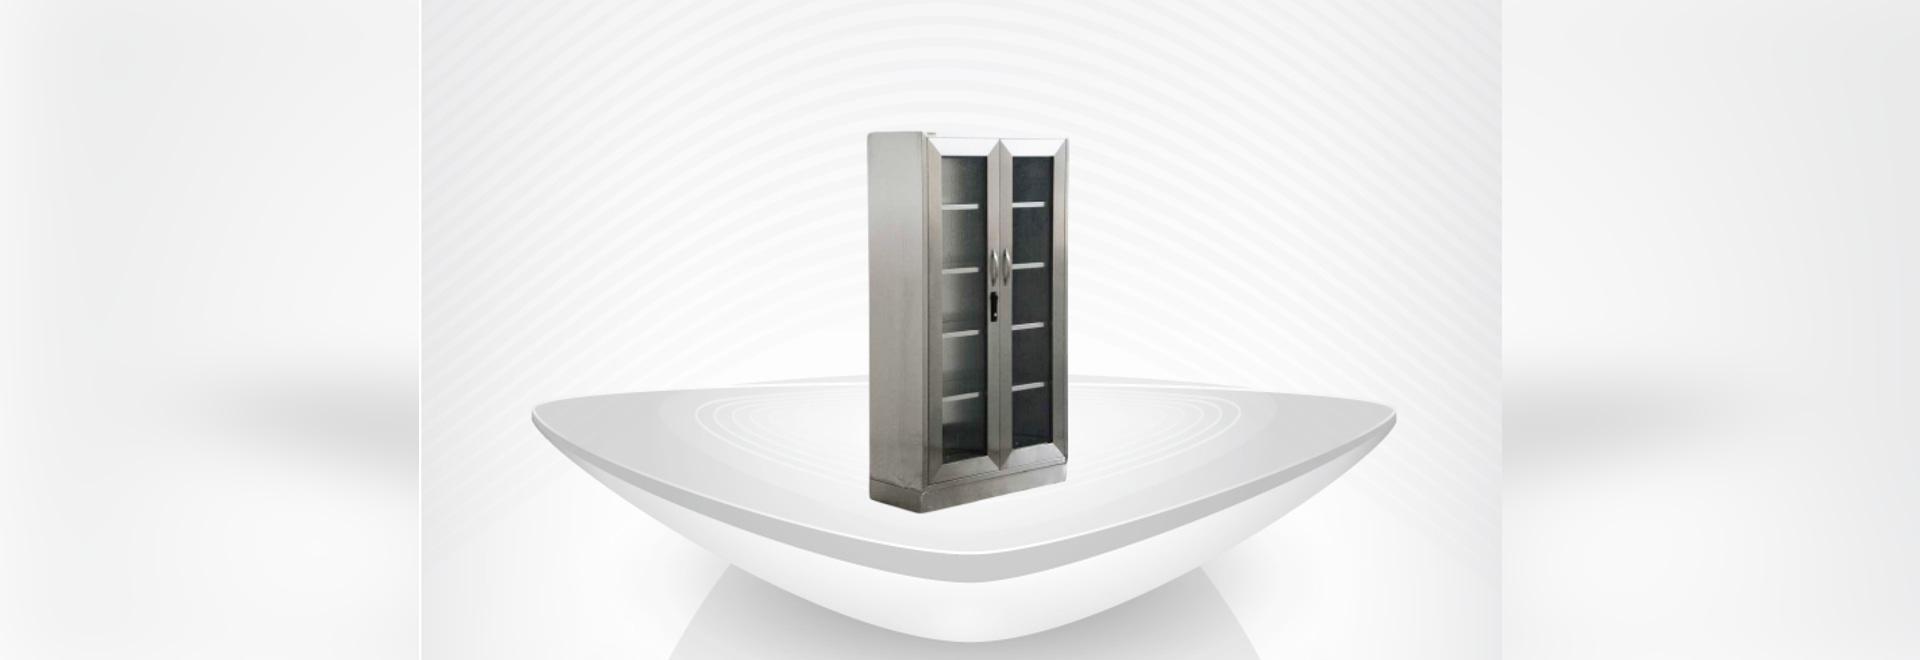 Cabinet d'acier inoxydable/Cabinet de bidule/Cabinet médical